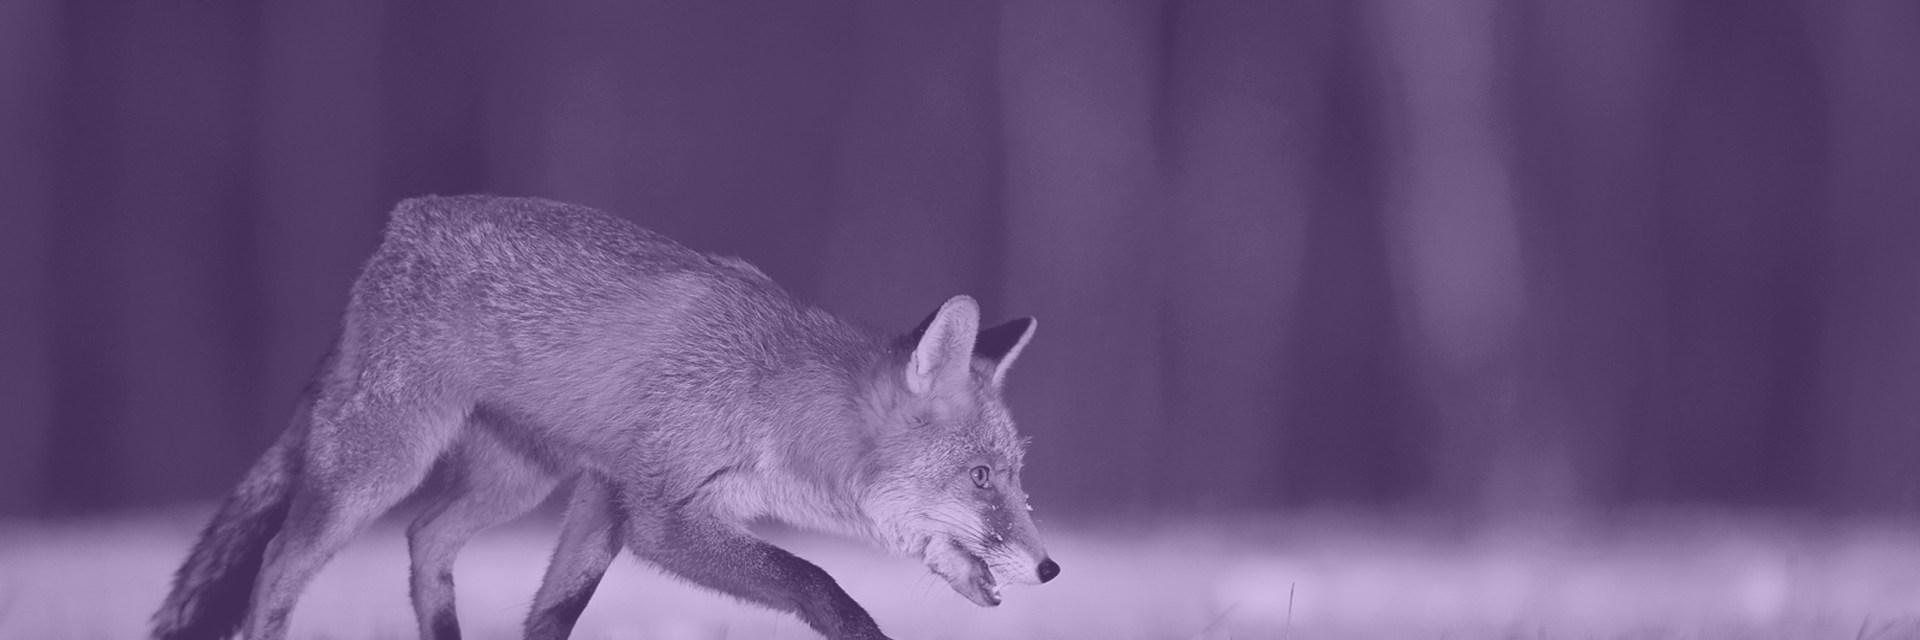 Purple Fox Malware Now Evolves to Spread Itself Across Windows Machines